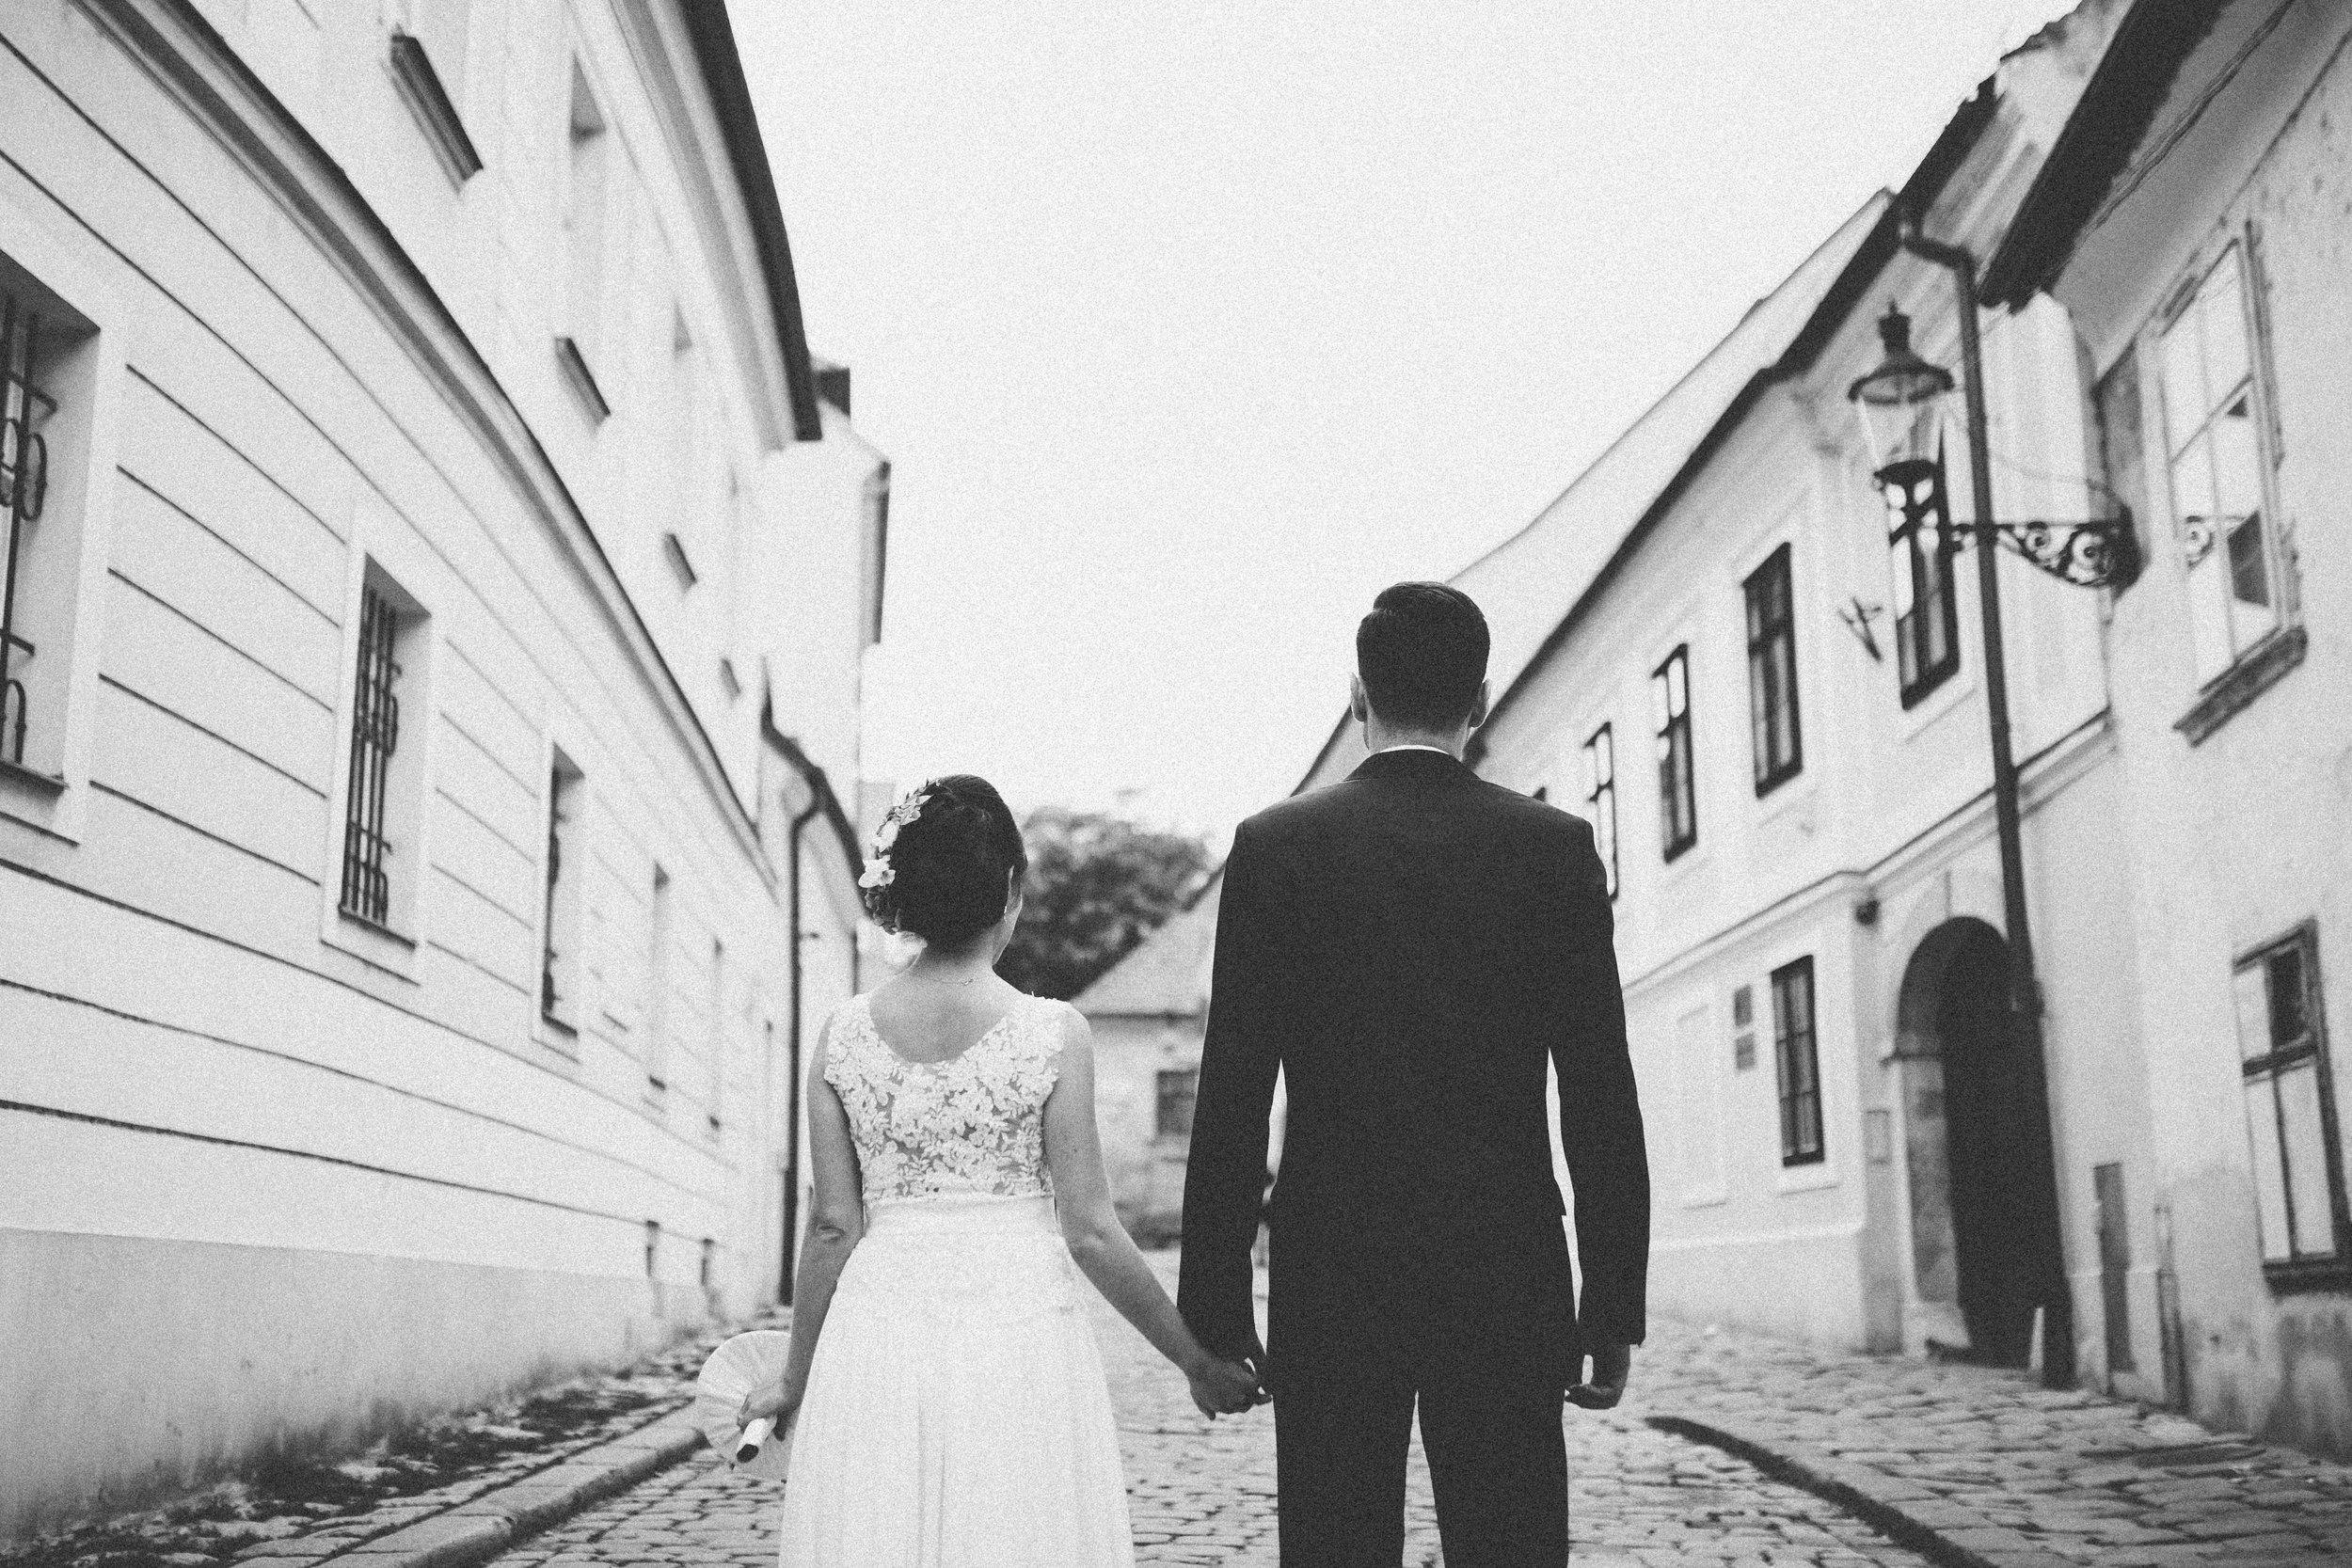 destination-wedding-photographer-bratislava-slovakia-europe-portrait-session-bw-documentary.jpg